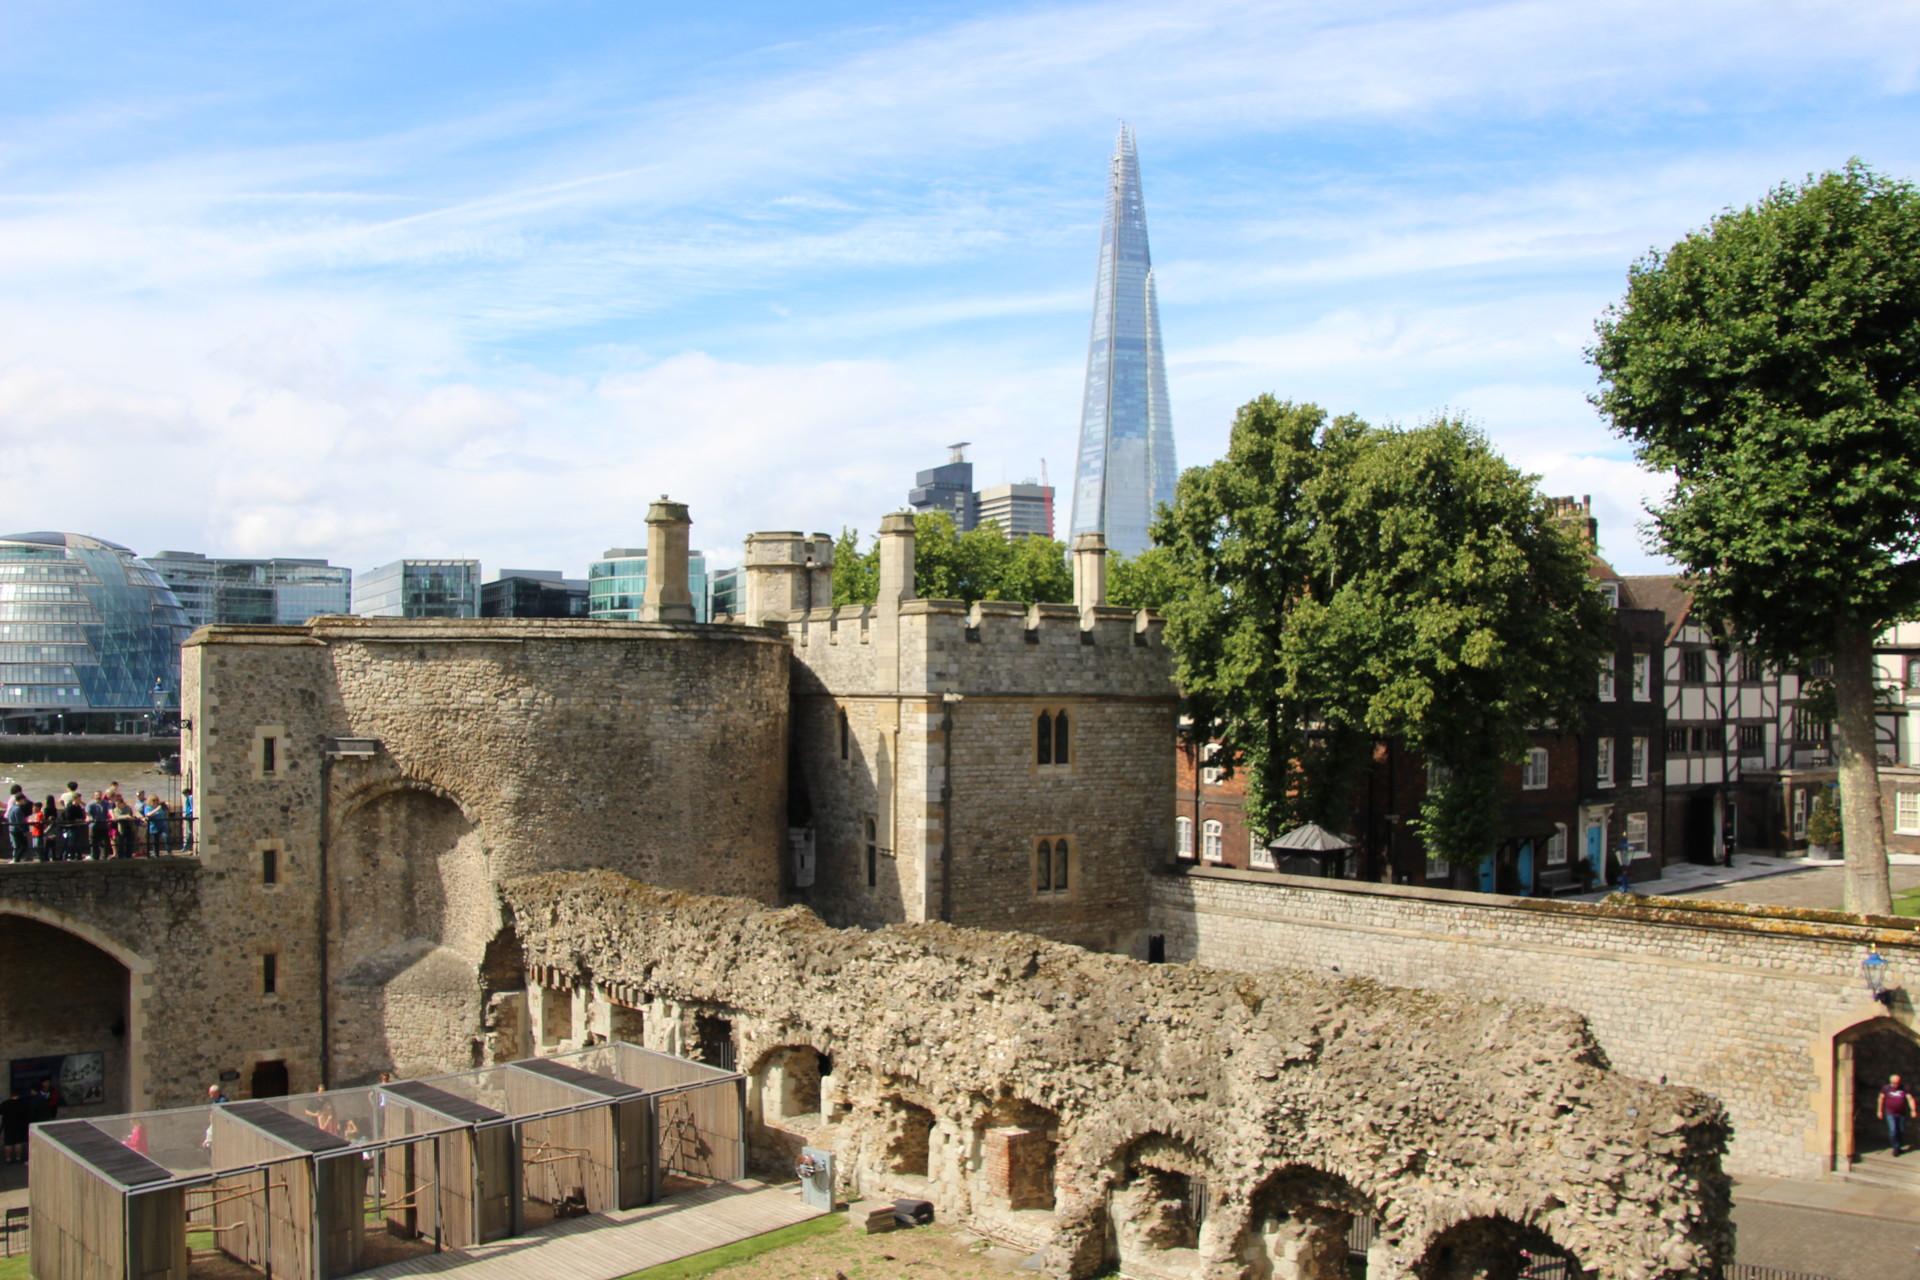 tower-of-london-la-torre-londres-7c1fedb